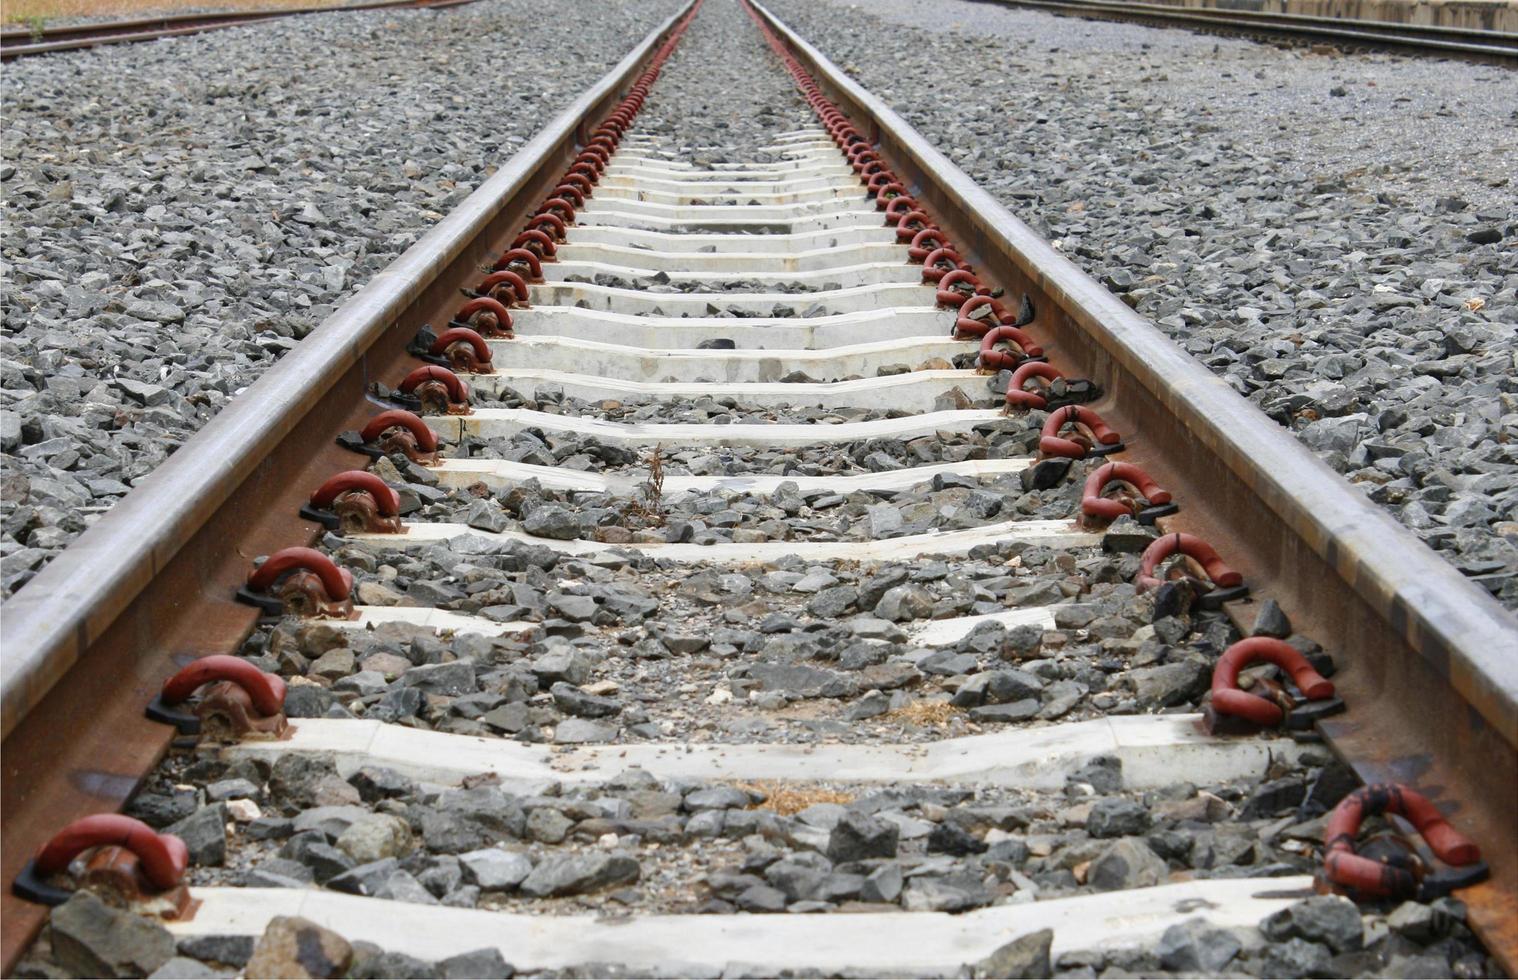 ferrocarril largo para tren foto